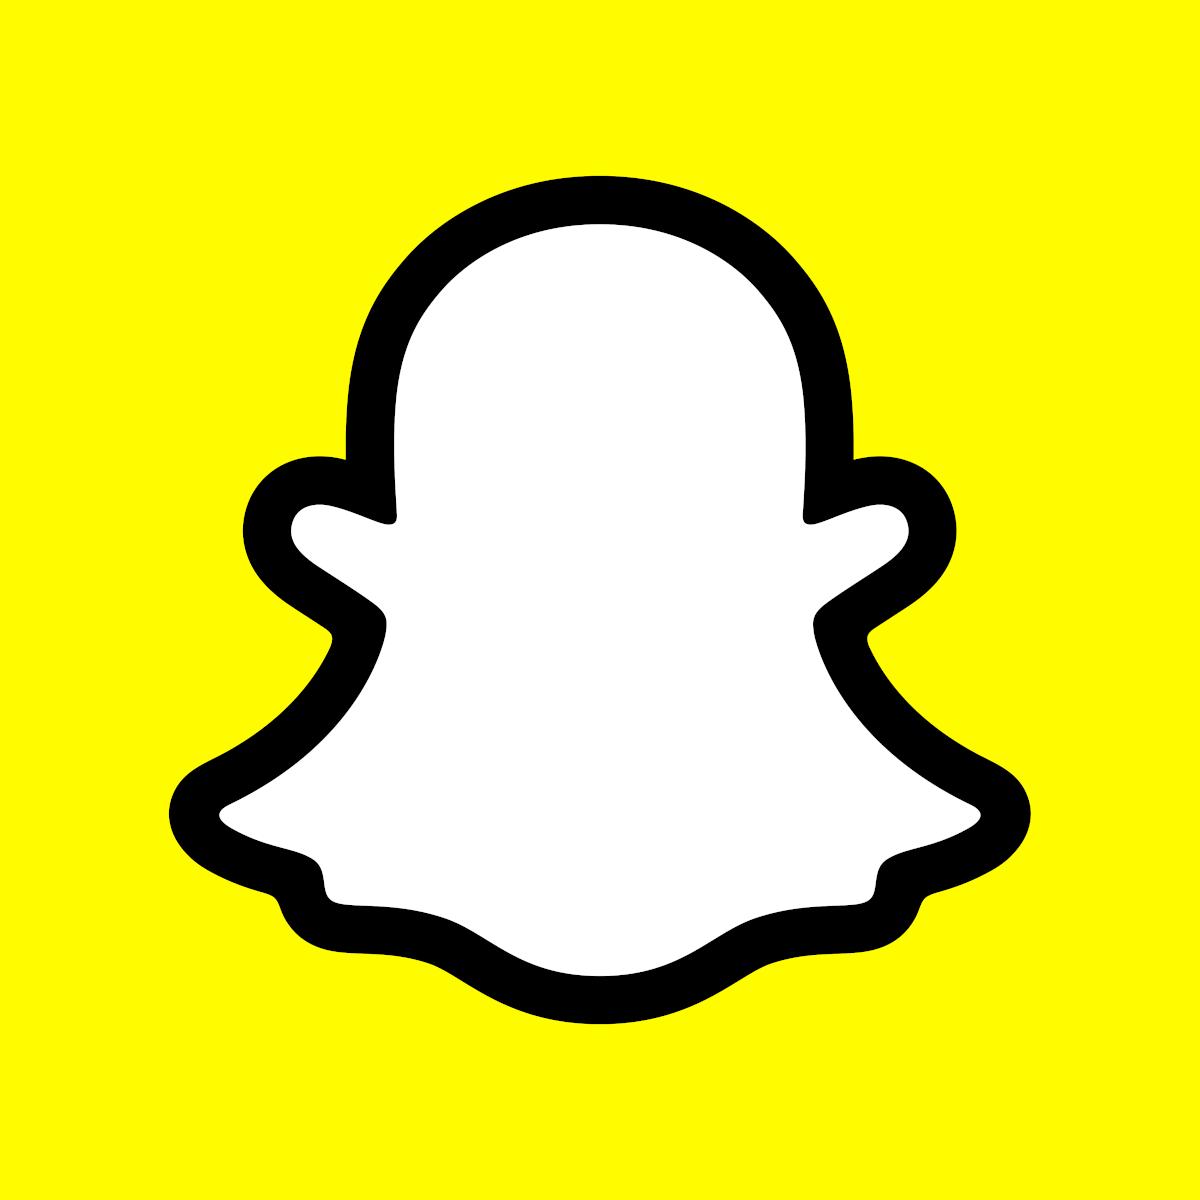 Shopify Snapchat app by Snap ads